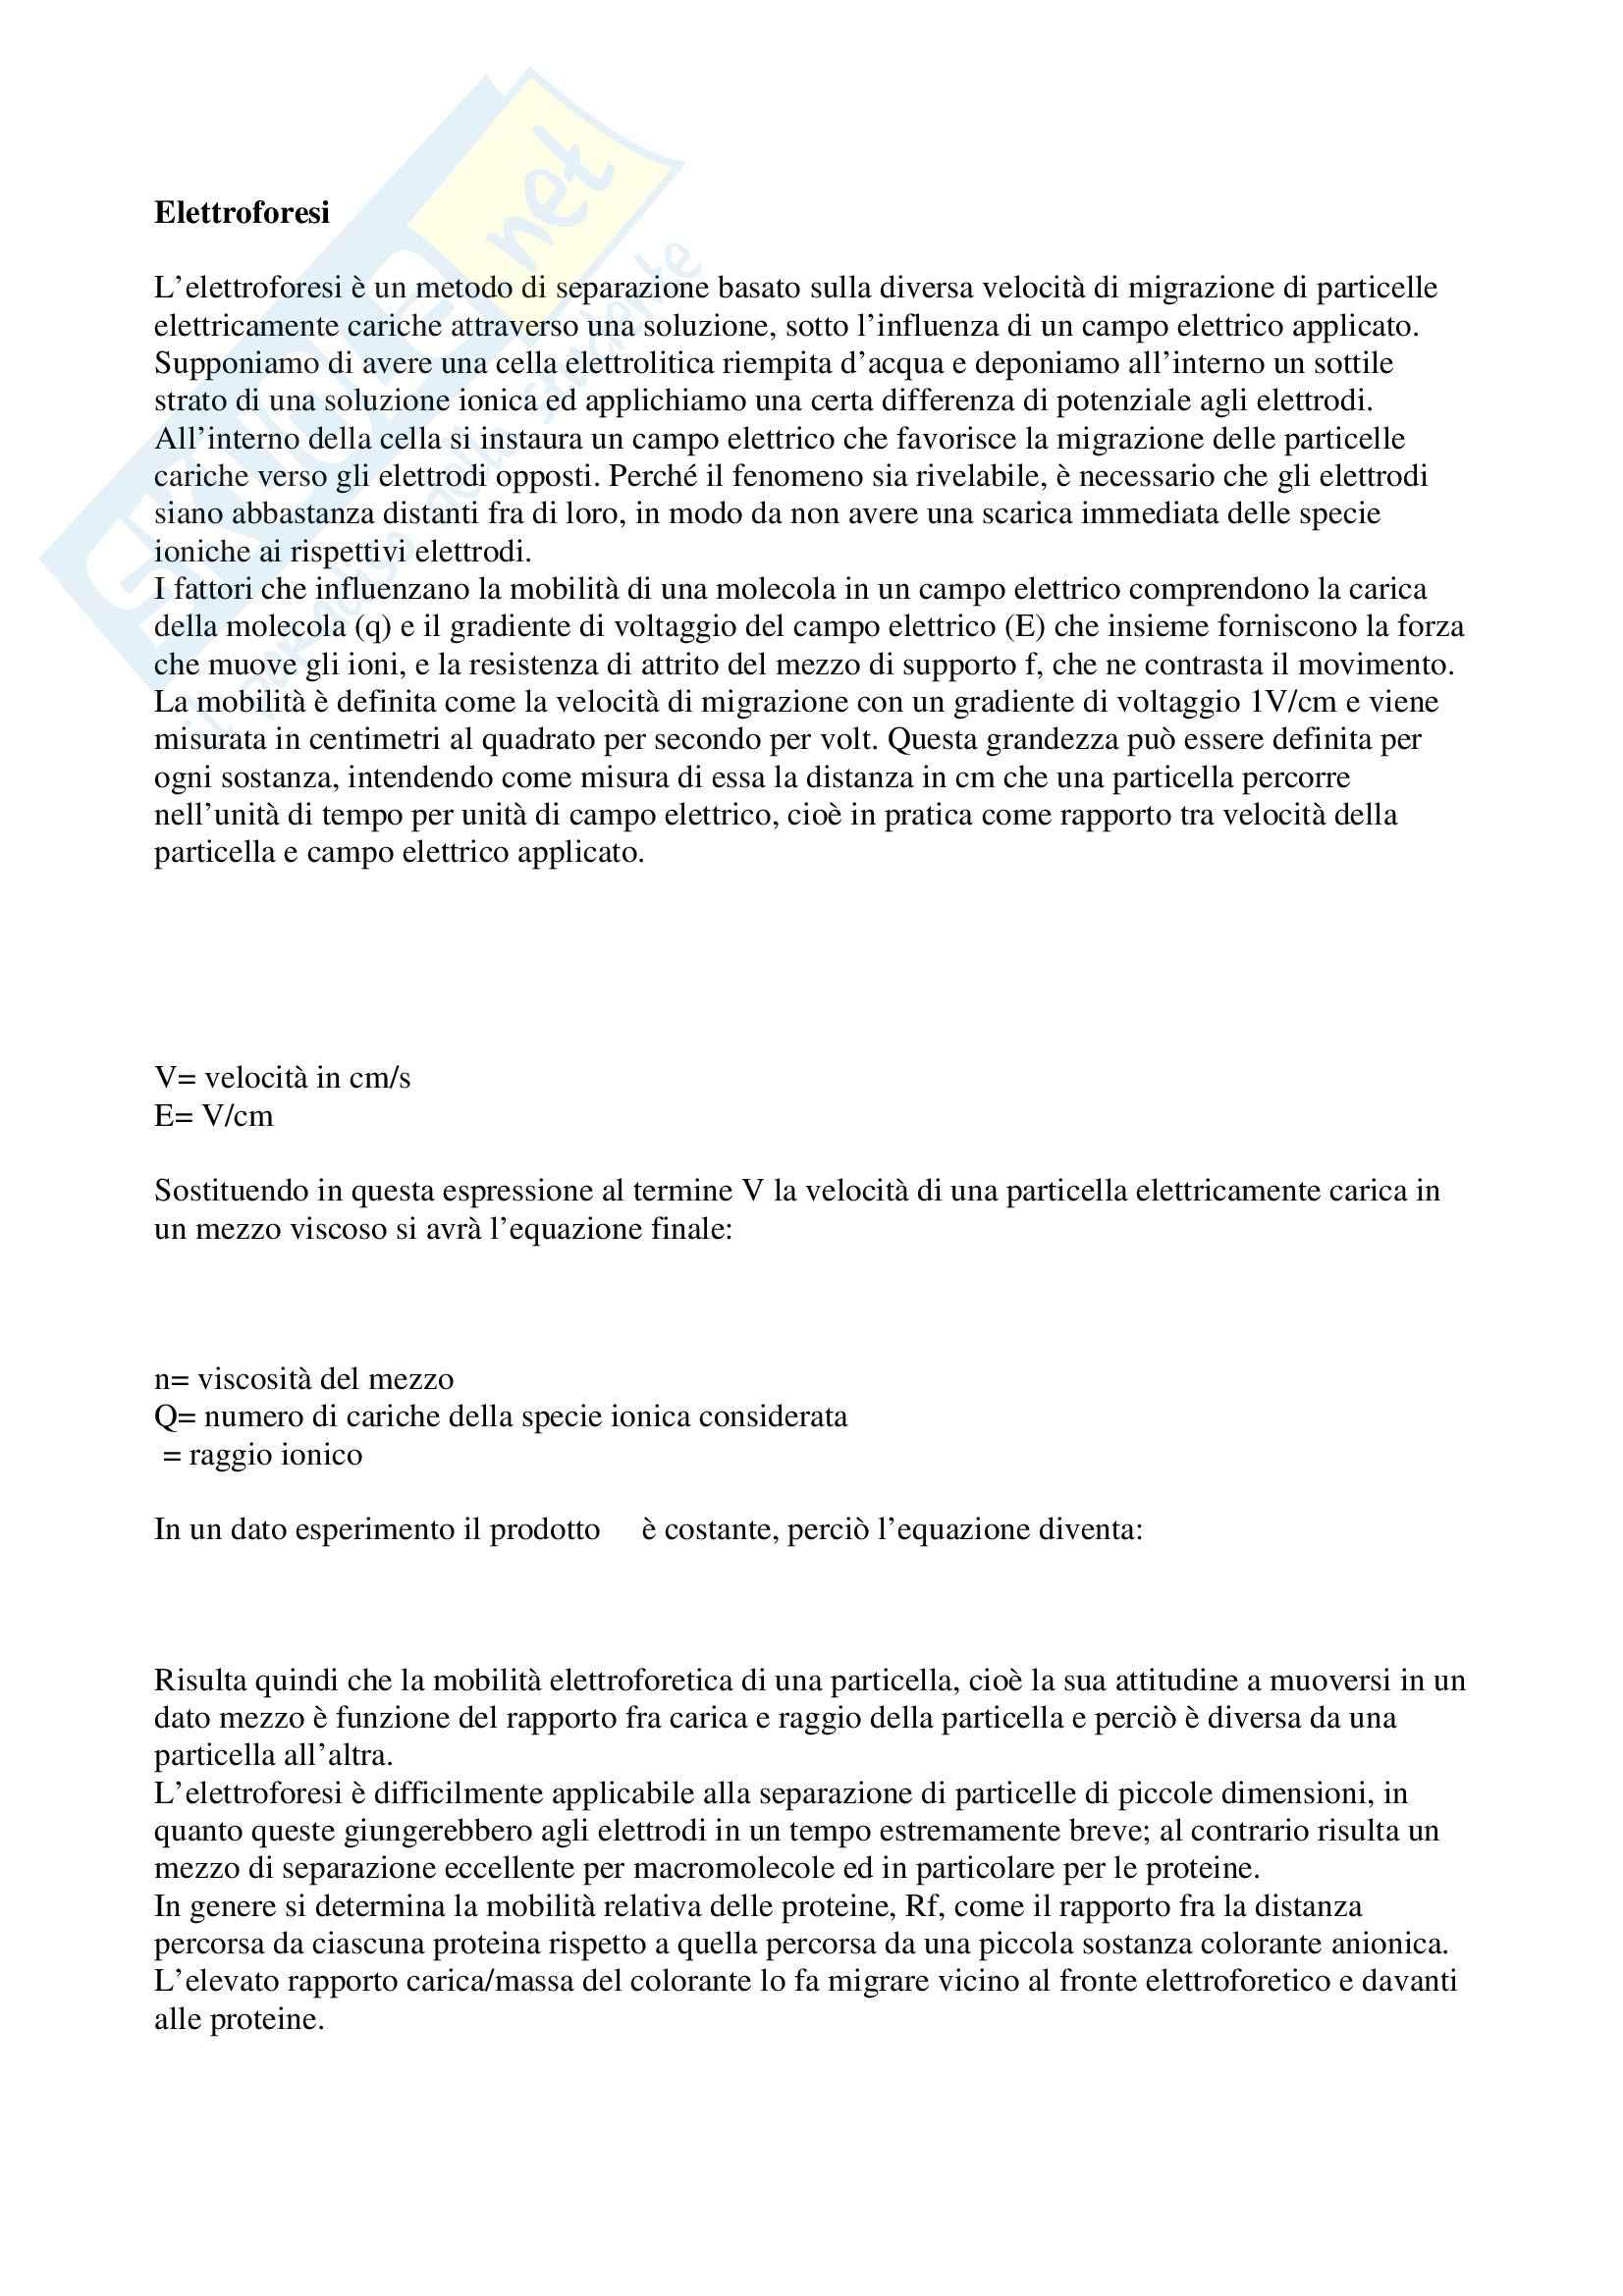 Biochimica applicata - elettroforesi